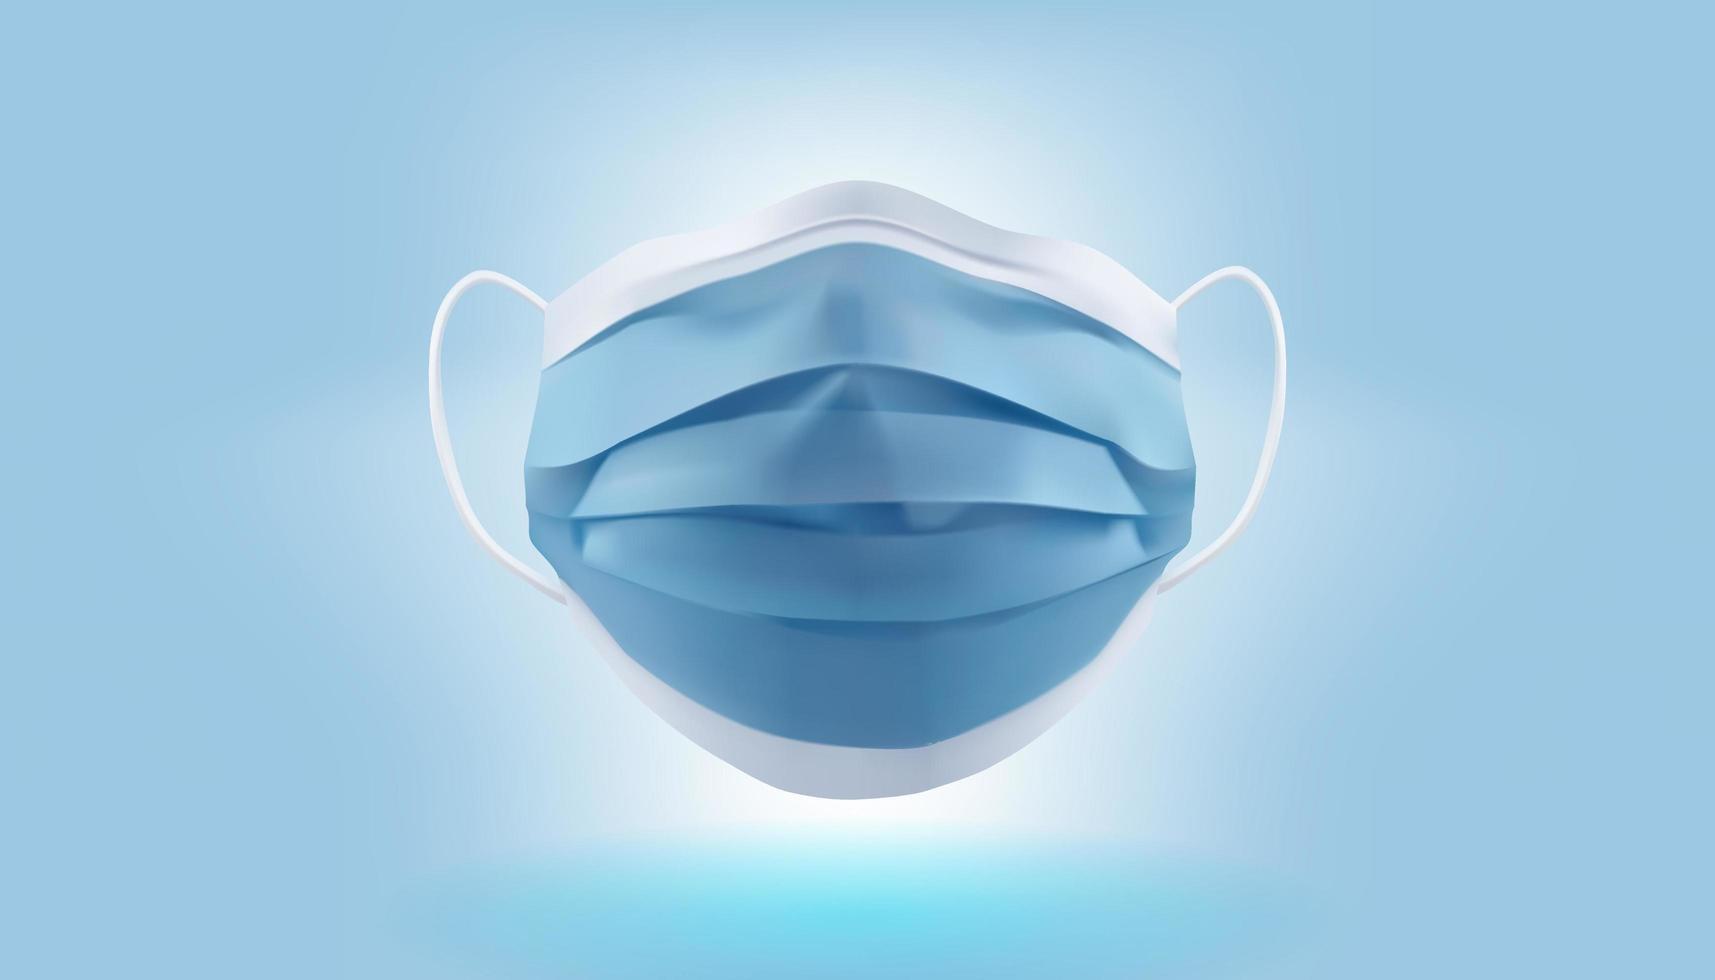 blå realistisk medicinsk ansiktsmask vektor